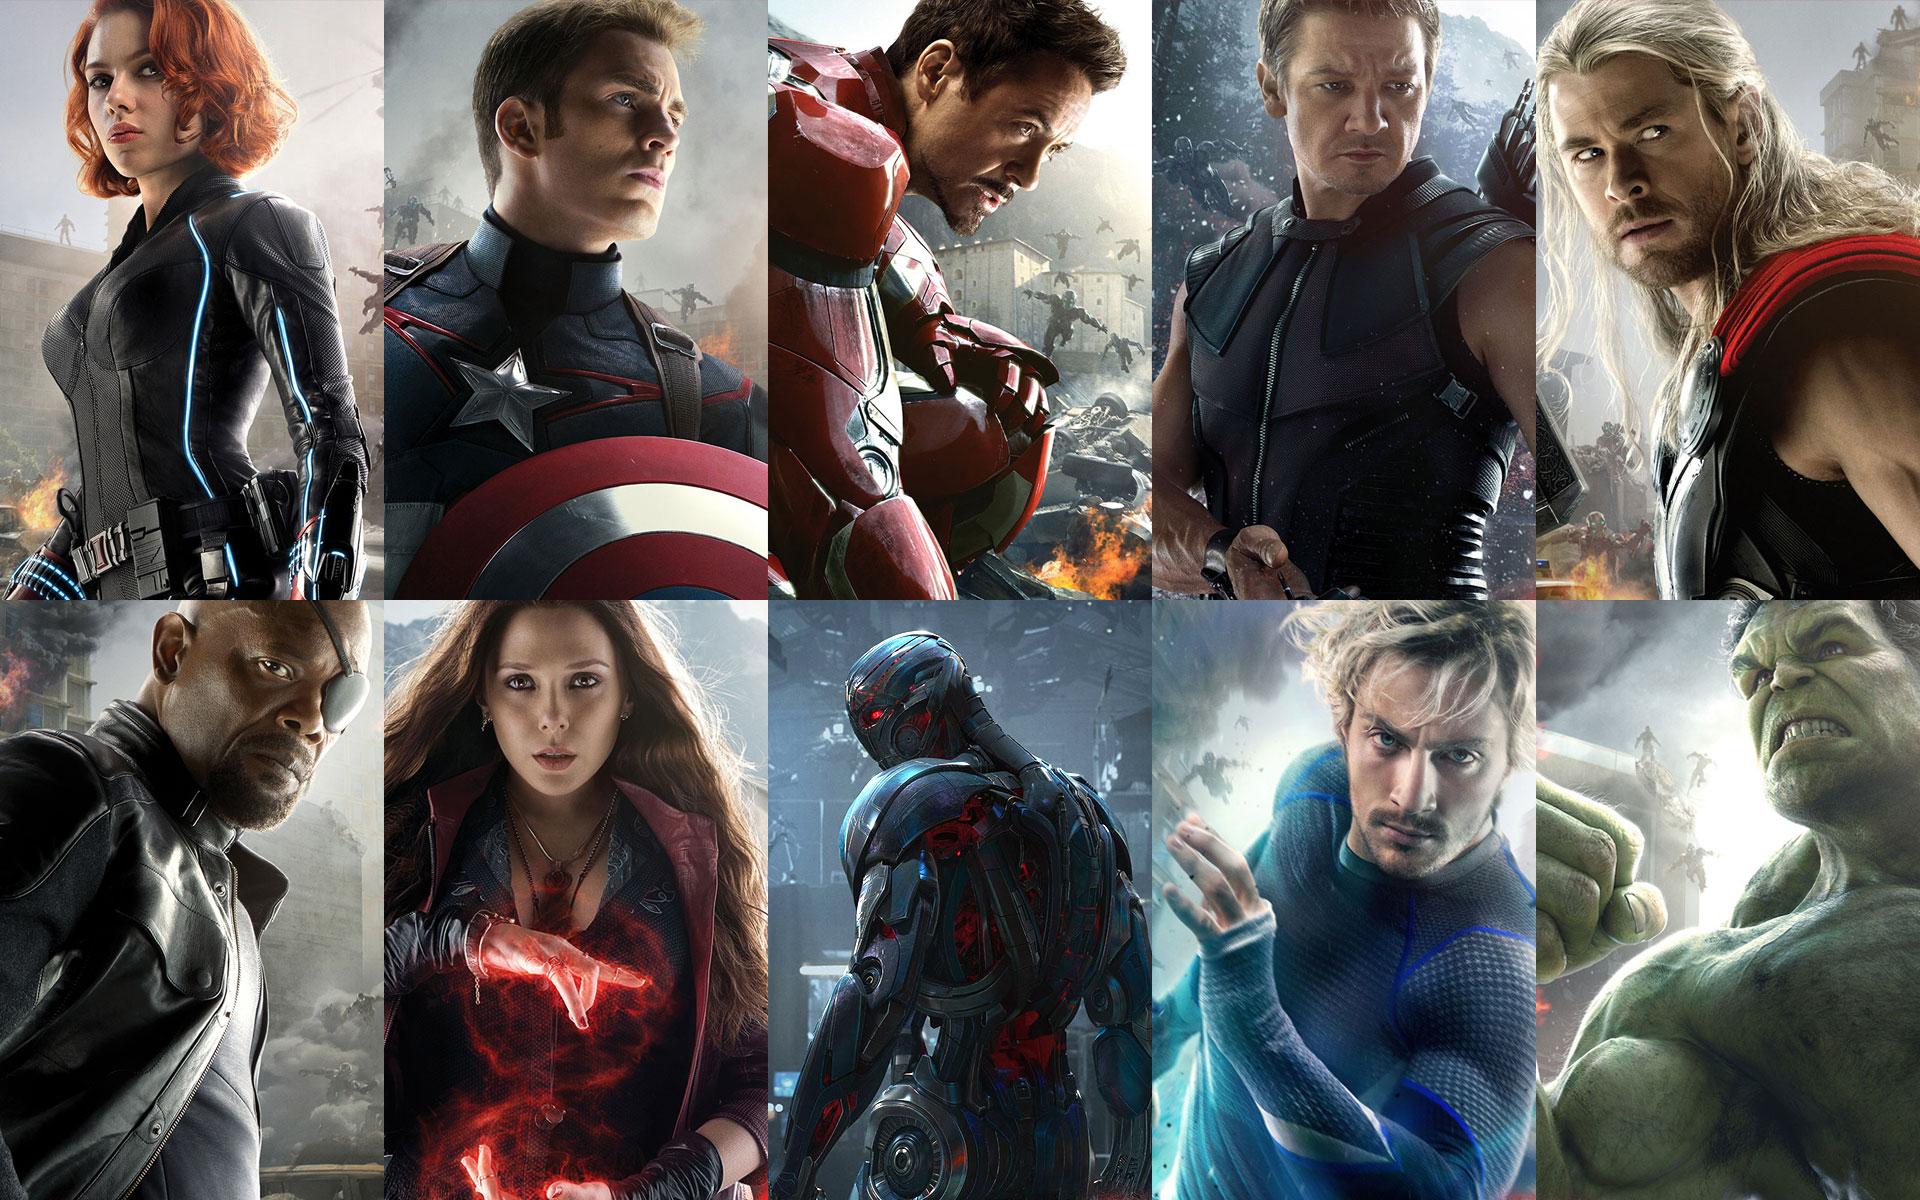 Avengers 2 Age of Ultron Wallpaper HD 51jpg 1920x1200